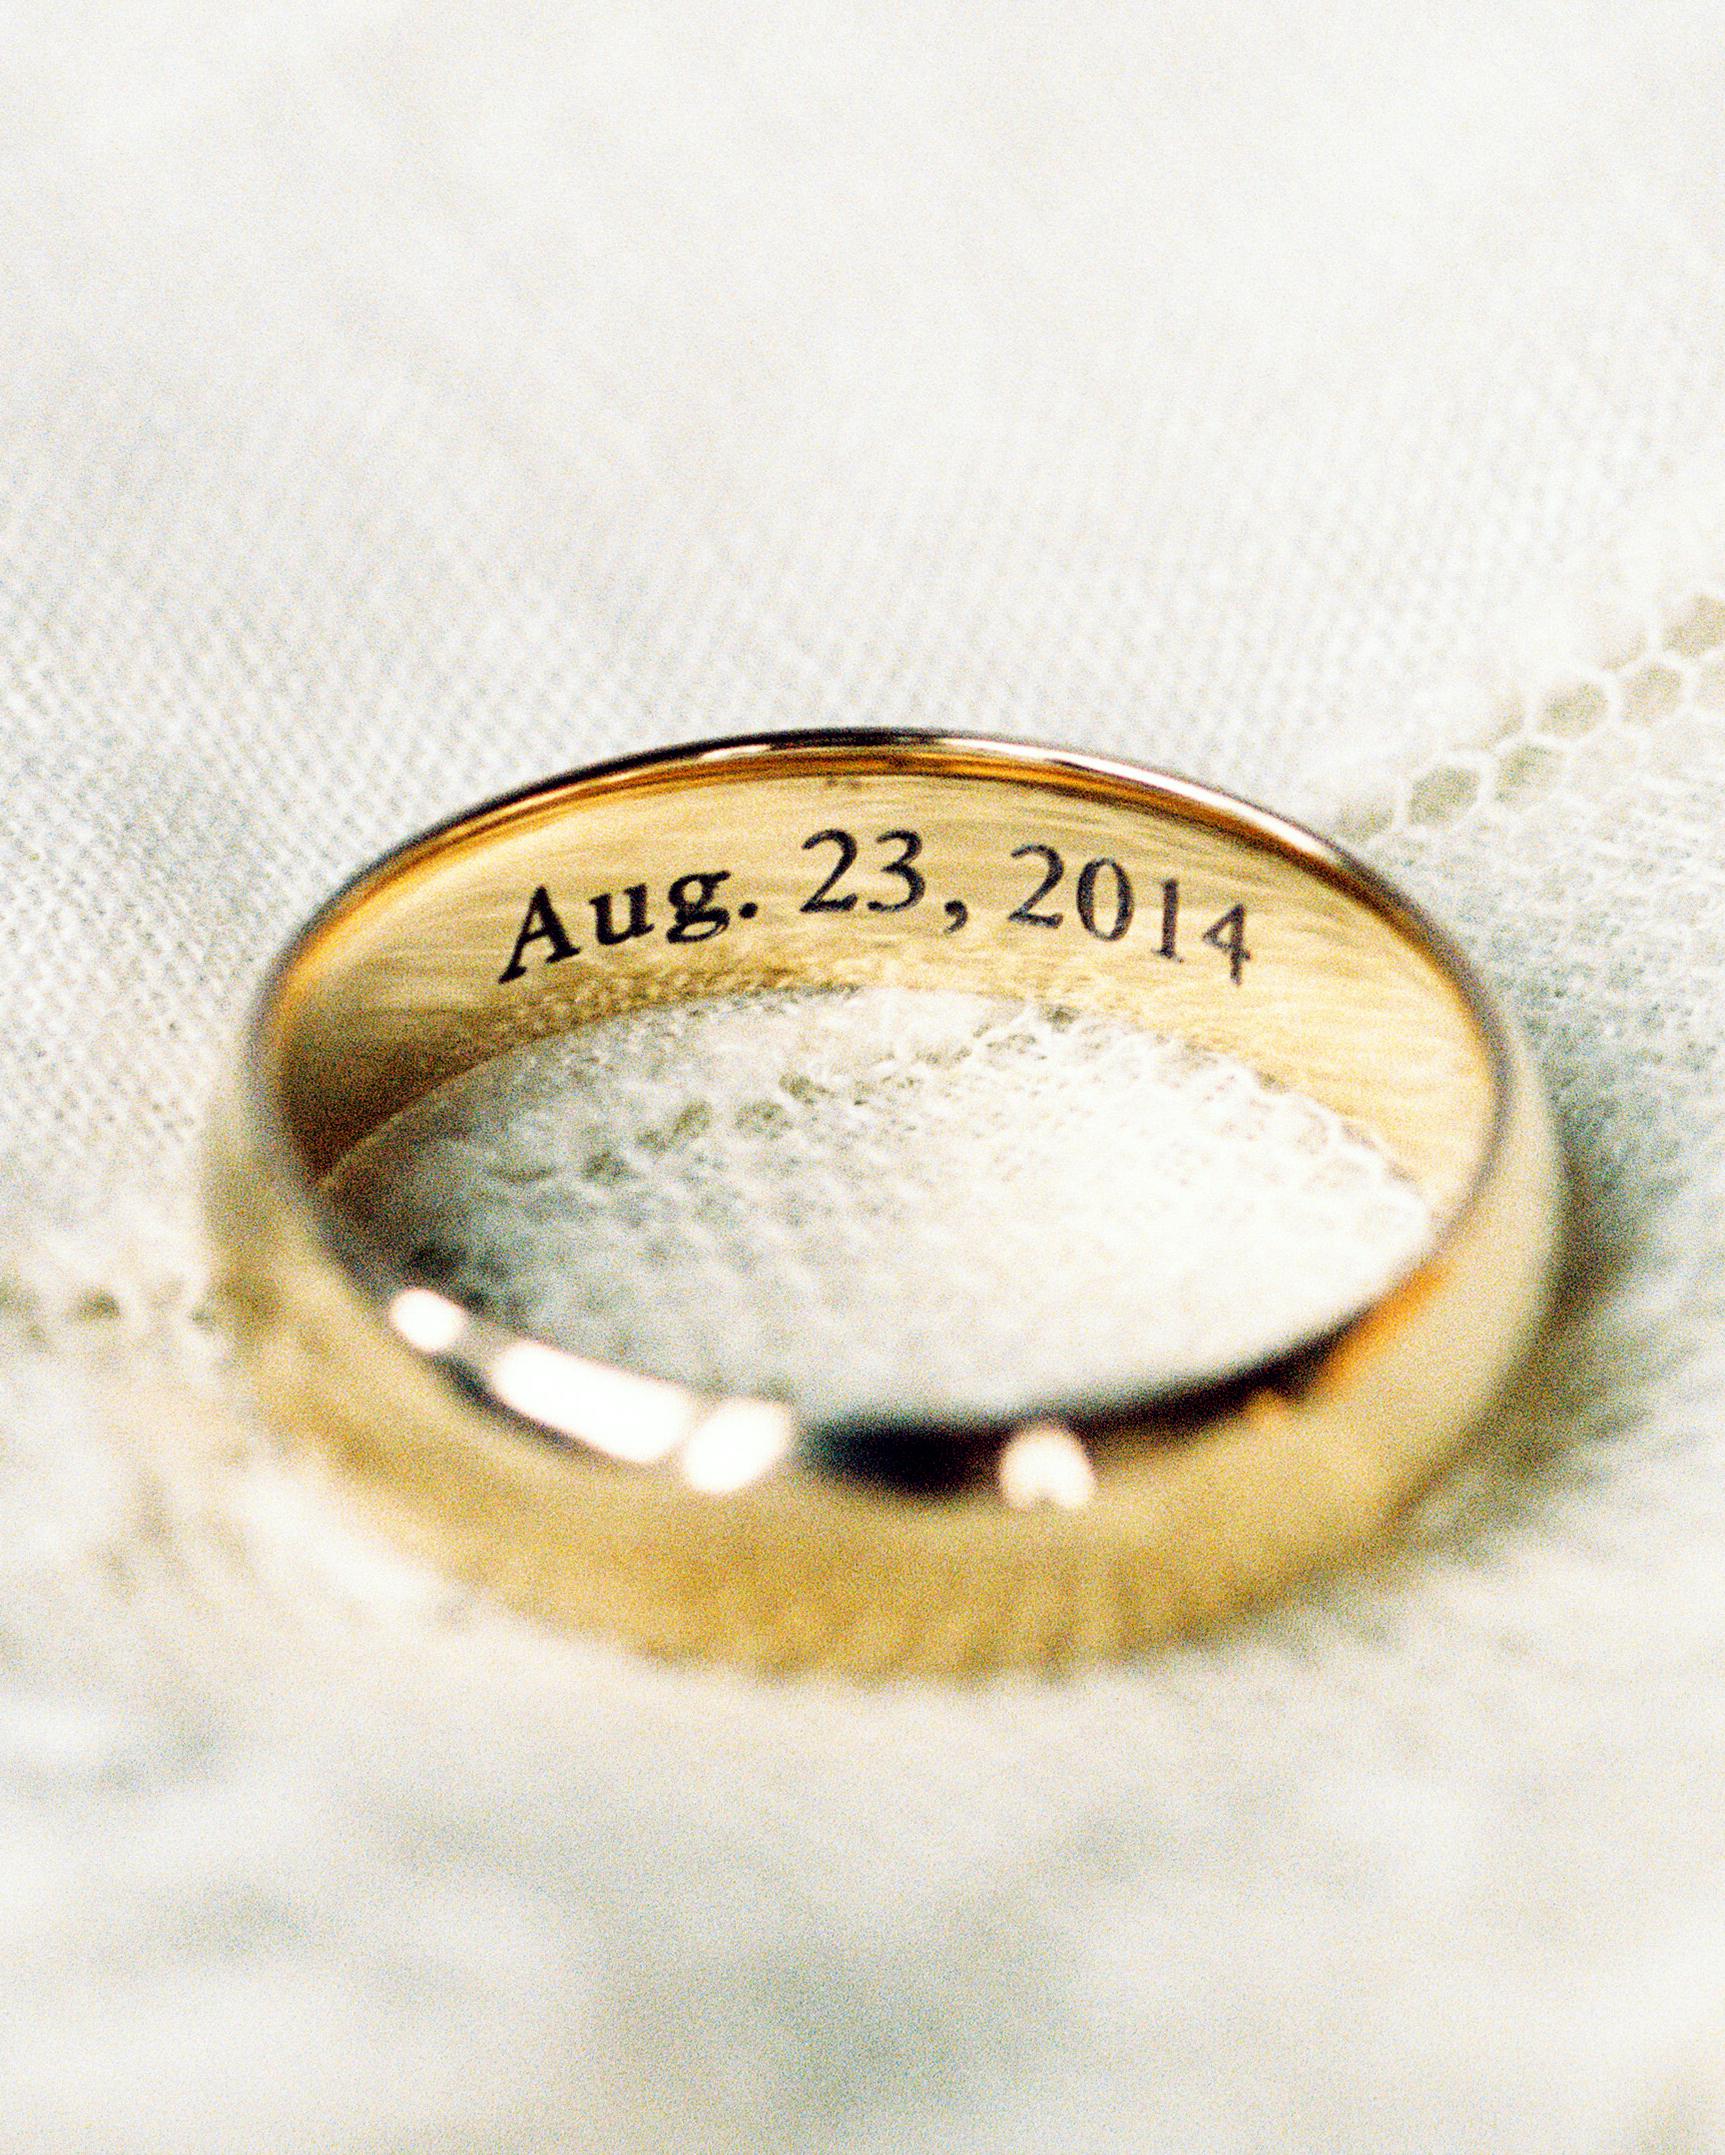 whitney-matt-wedding-ring-003-s111817-0215.jpg